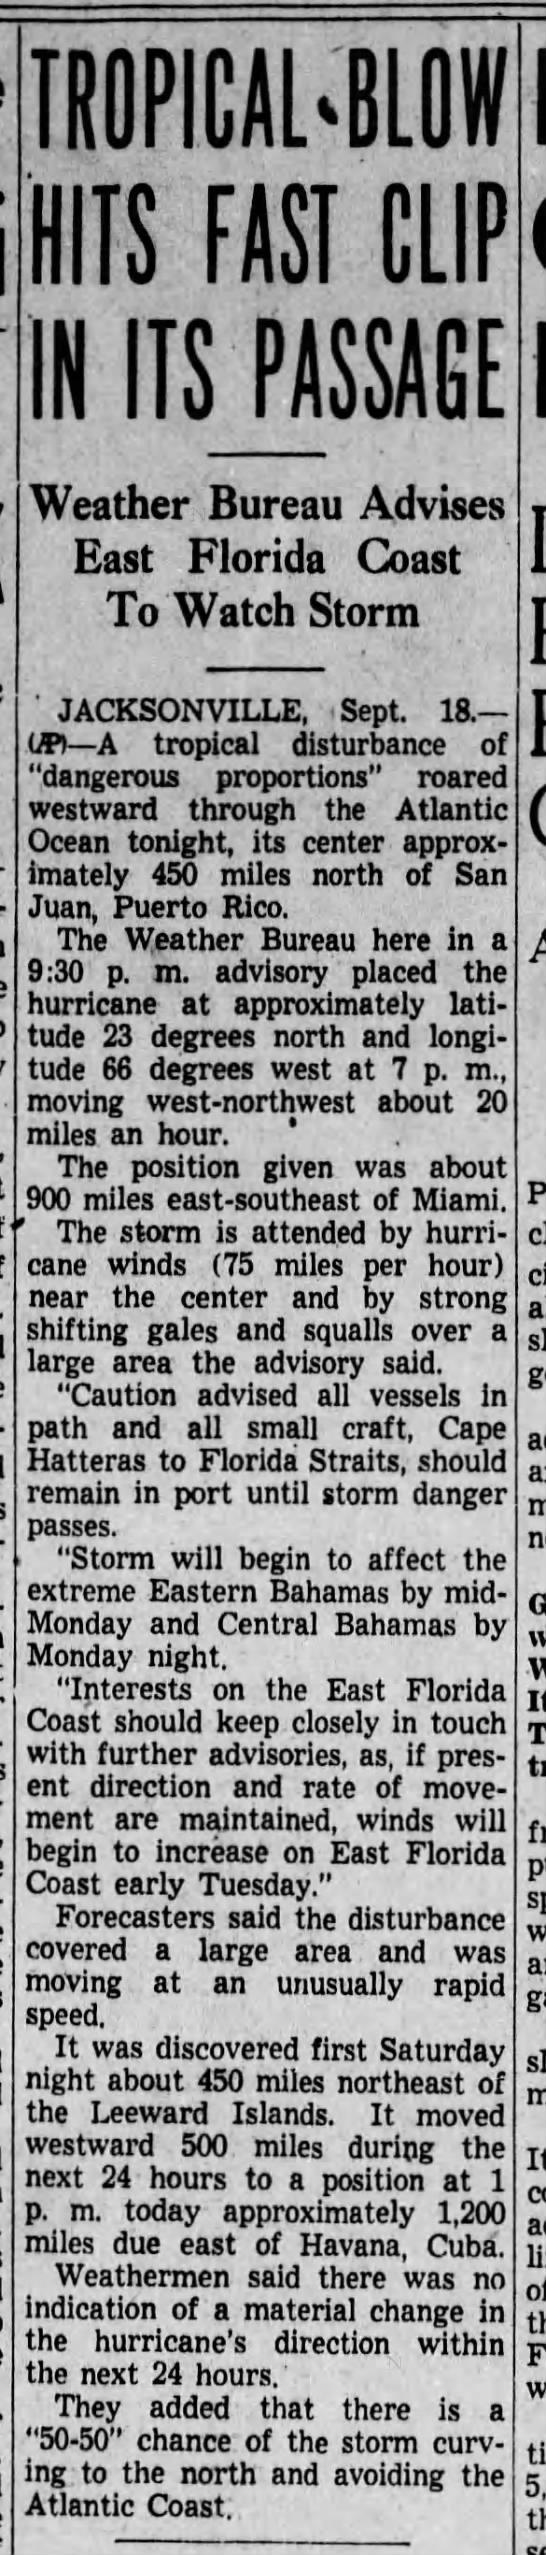 Hurricane may hit Florida, 1938 - TROPICAL-BLOW TROPICAL-BLOW TROPICAL-BLOW HITS...